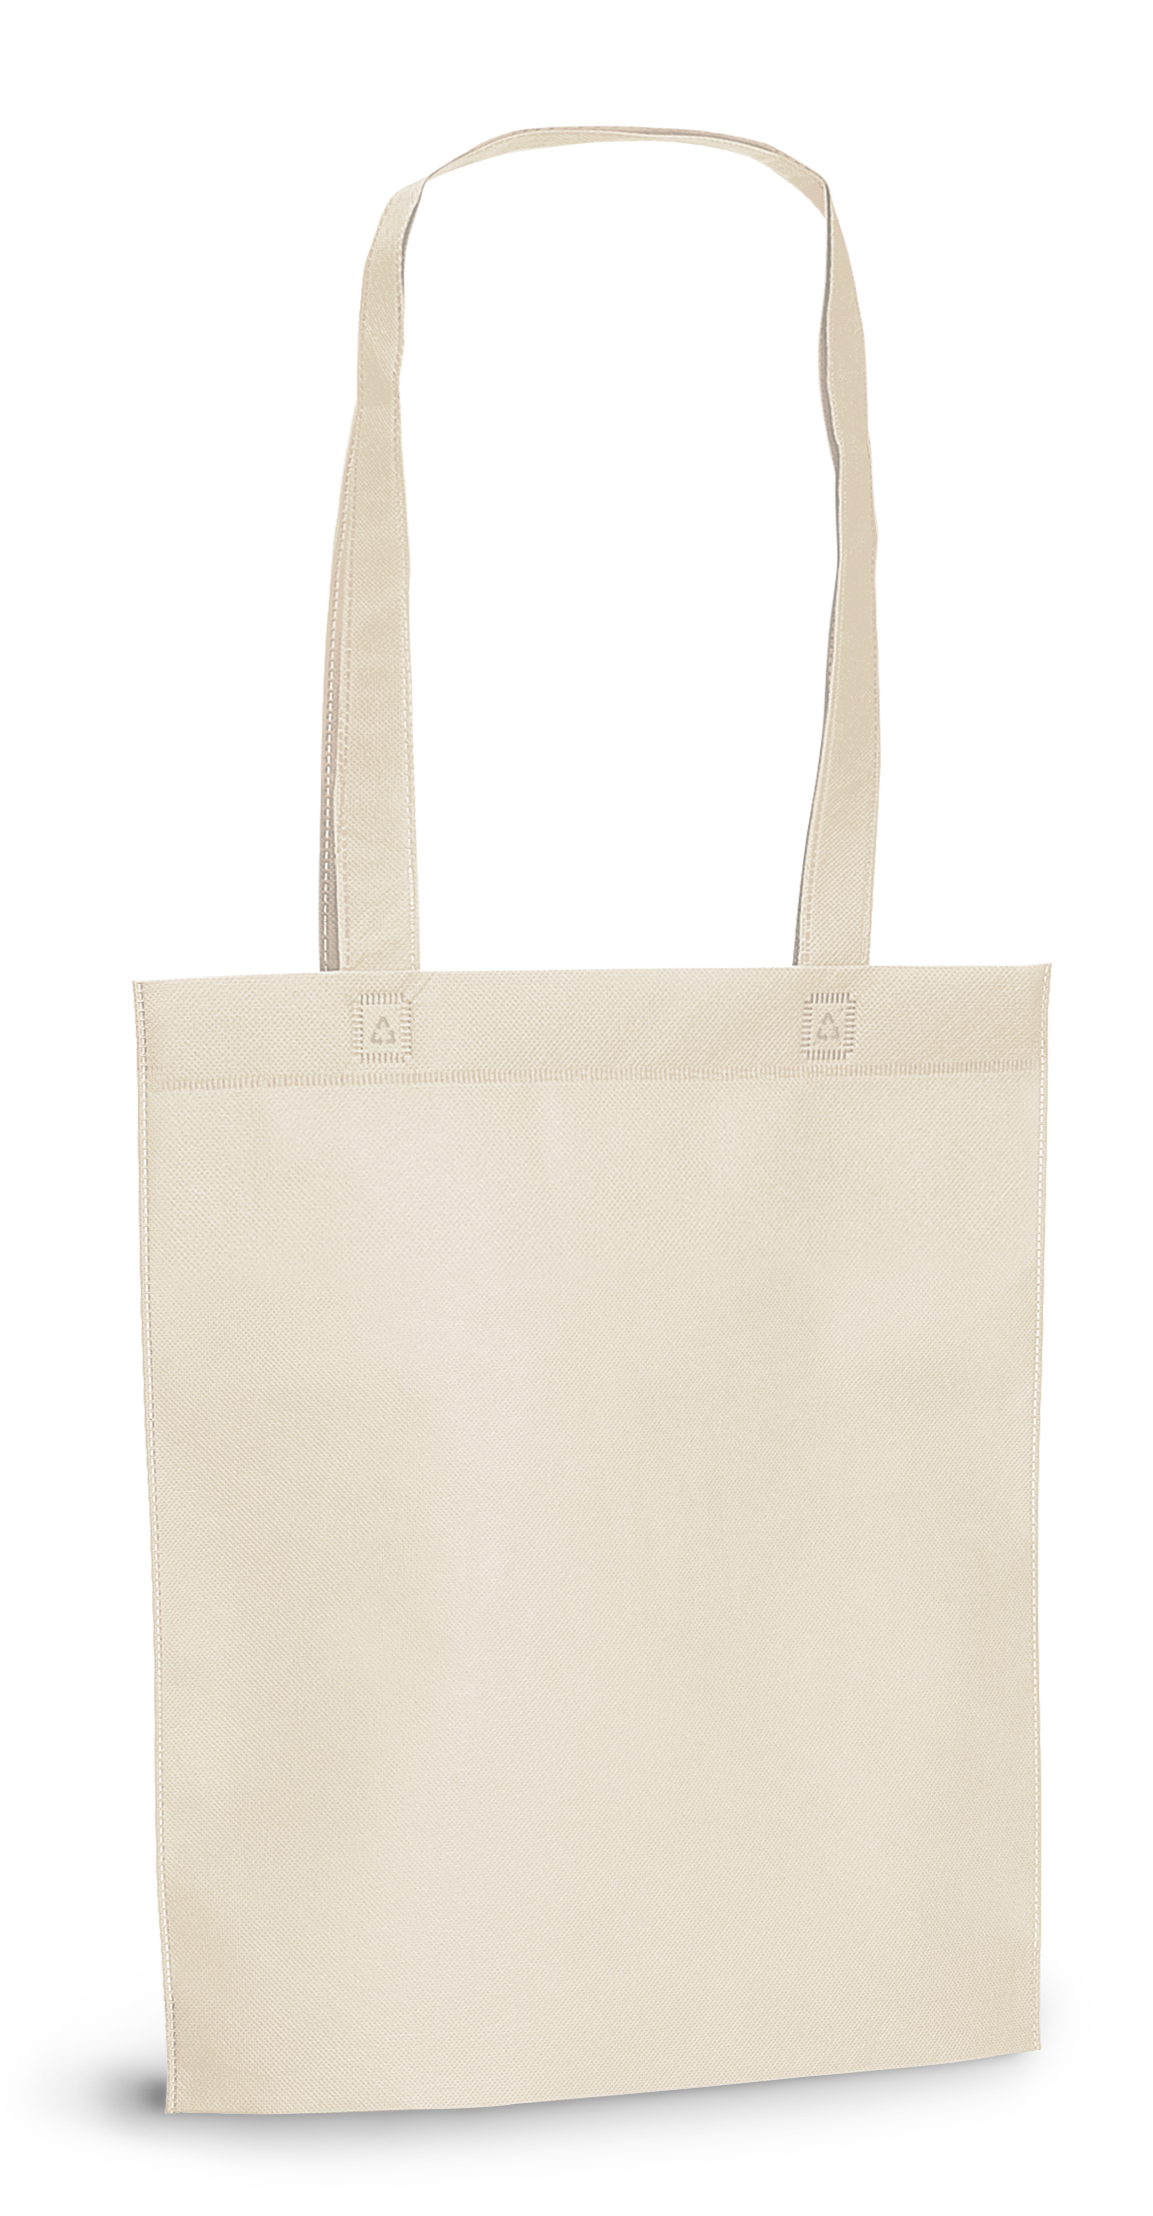 Lanner Eco Bag Product Code GP92839